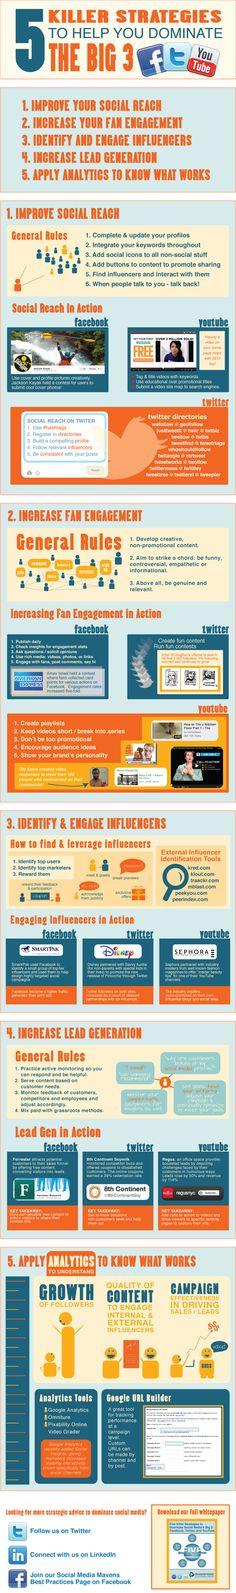 Basic tips (but still good) Social Media infographic